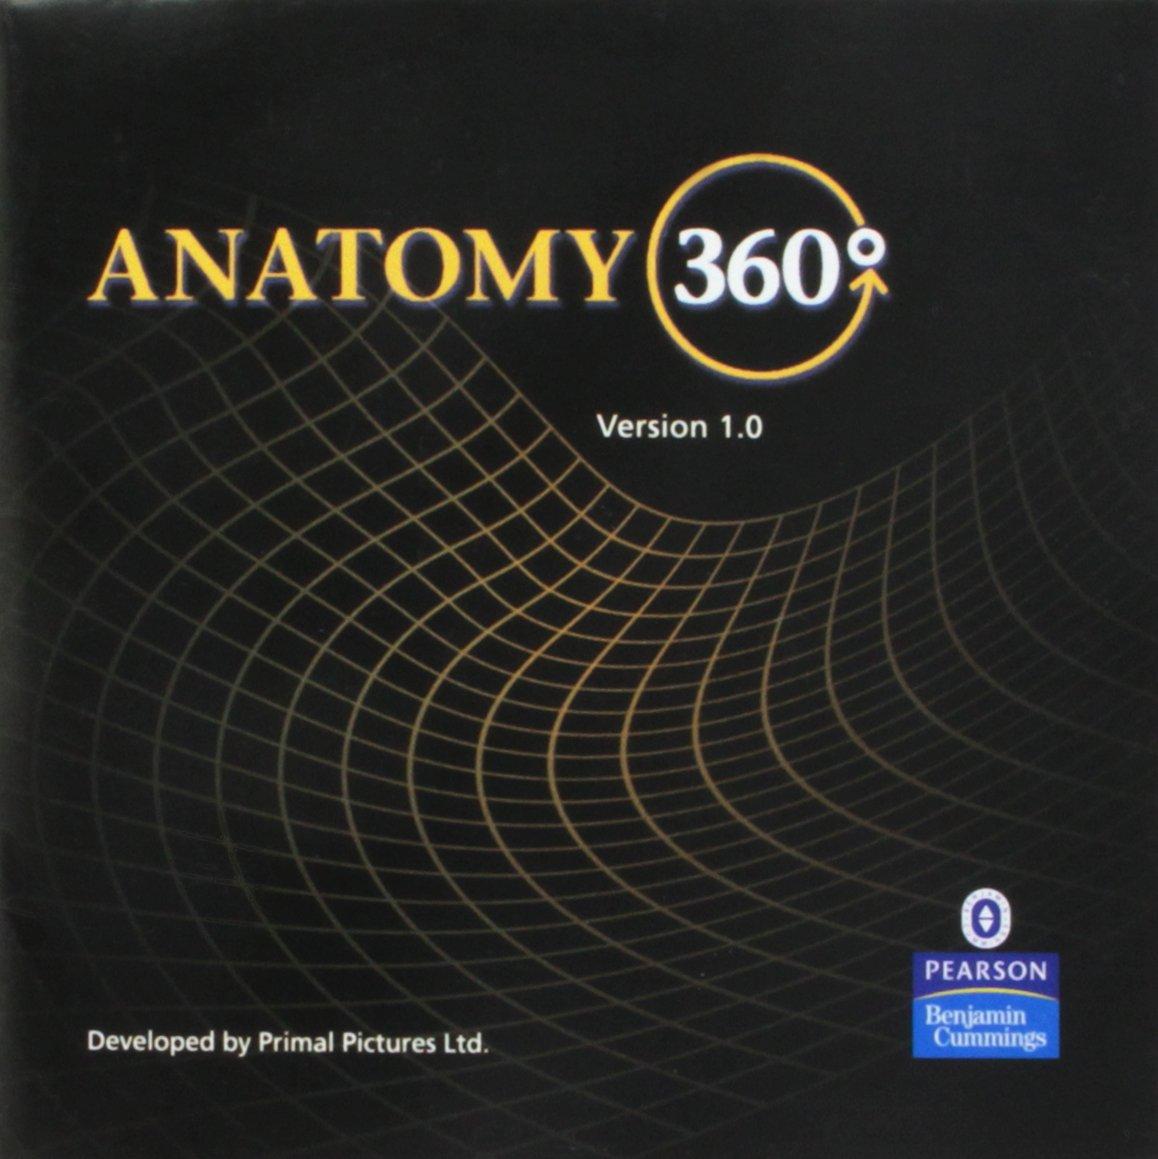 Anatomy 360 Degrees Cd Rom Amazon Primal Pictures